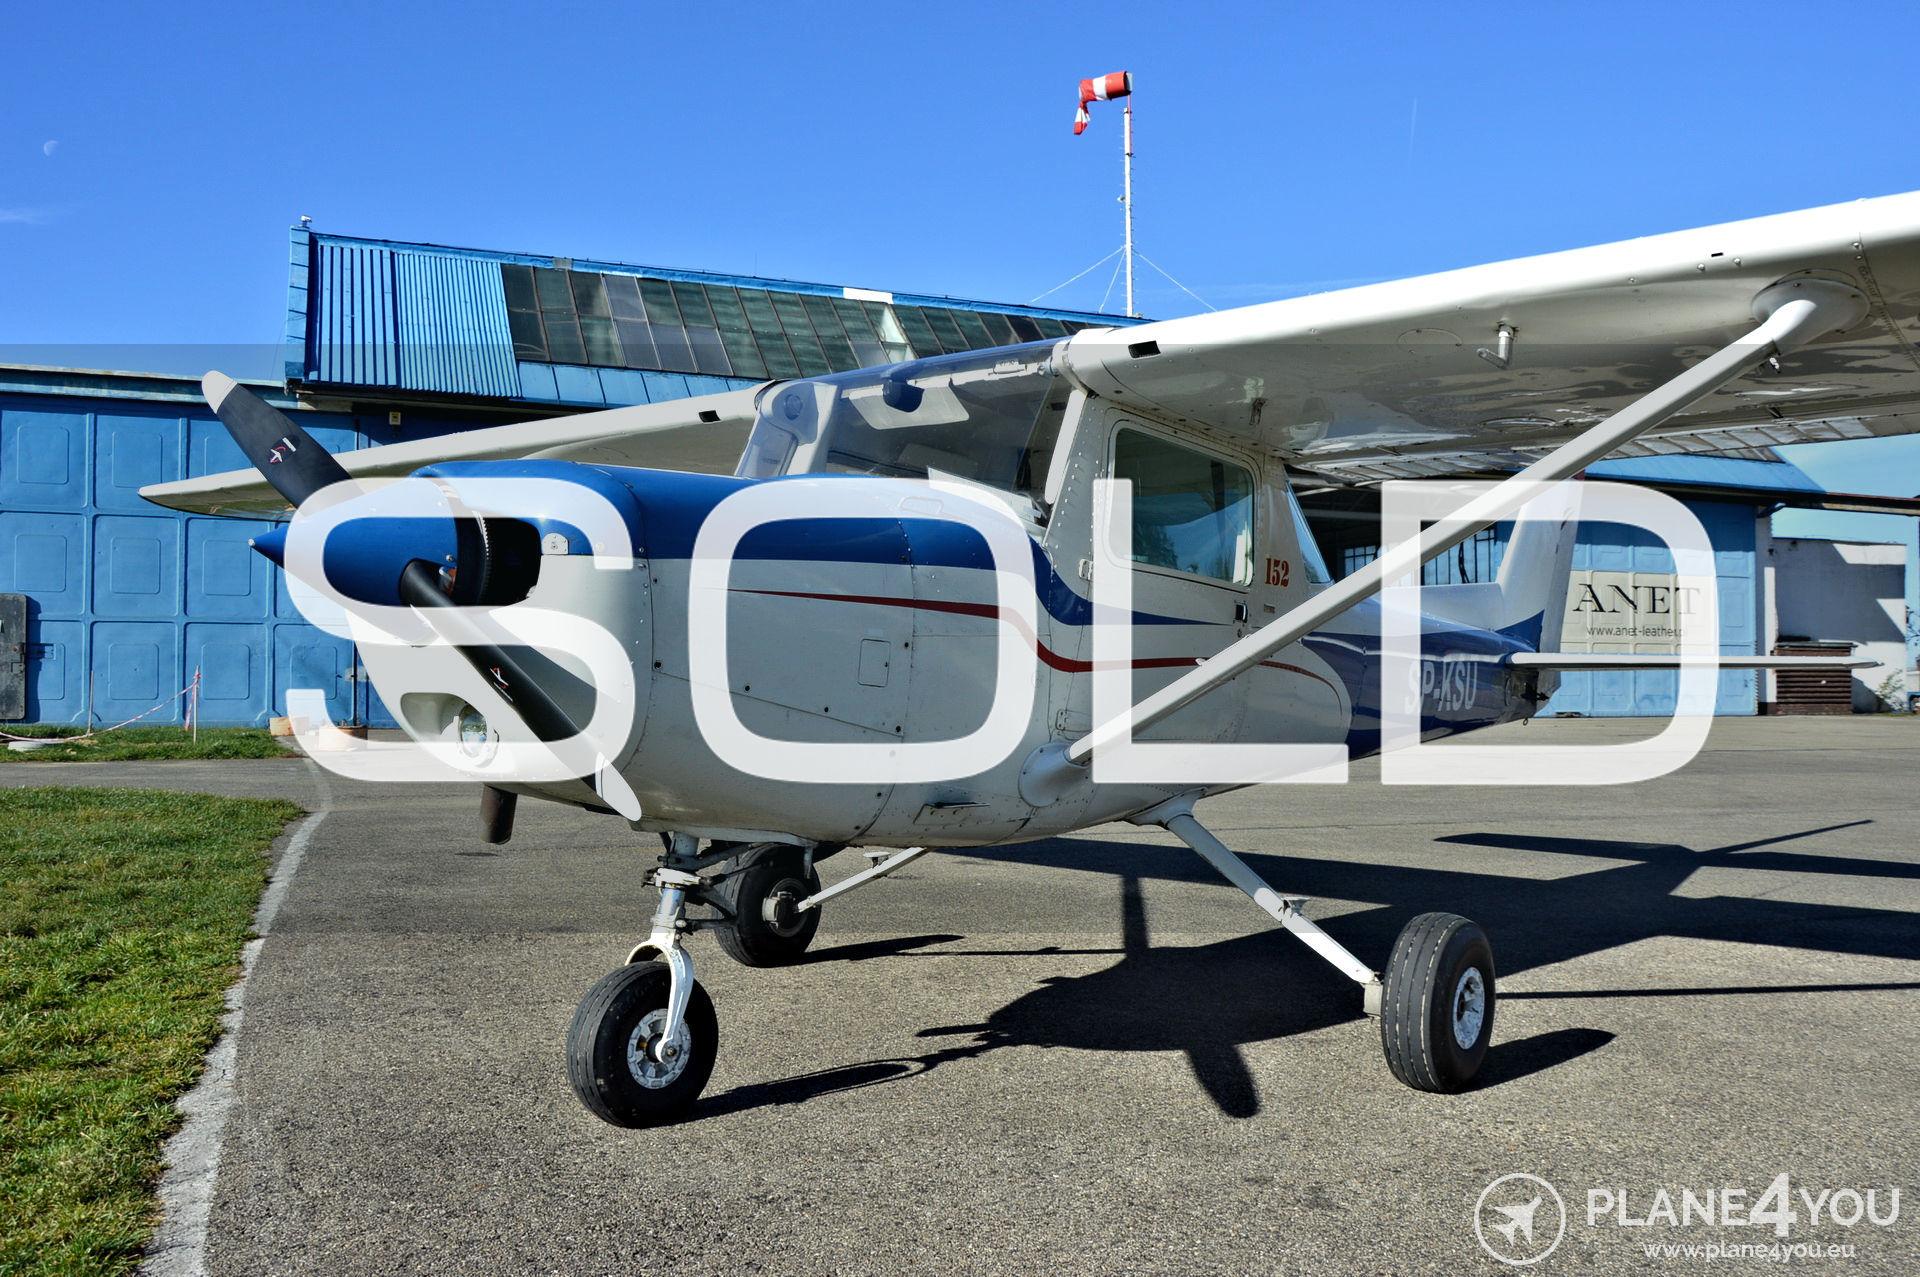 129  Cessna 152 SP-KSU | Sold aircraft | Plane4You Aircraft